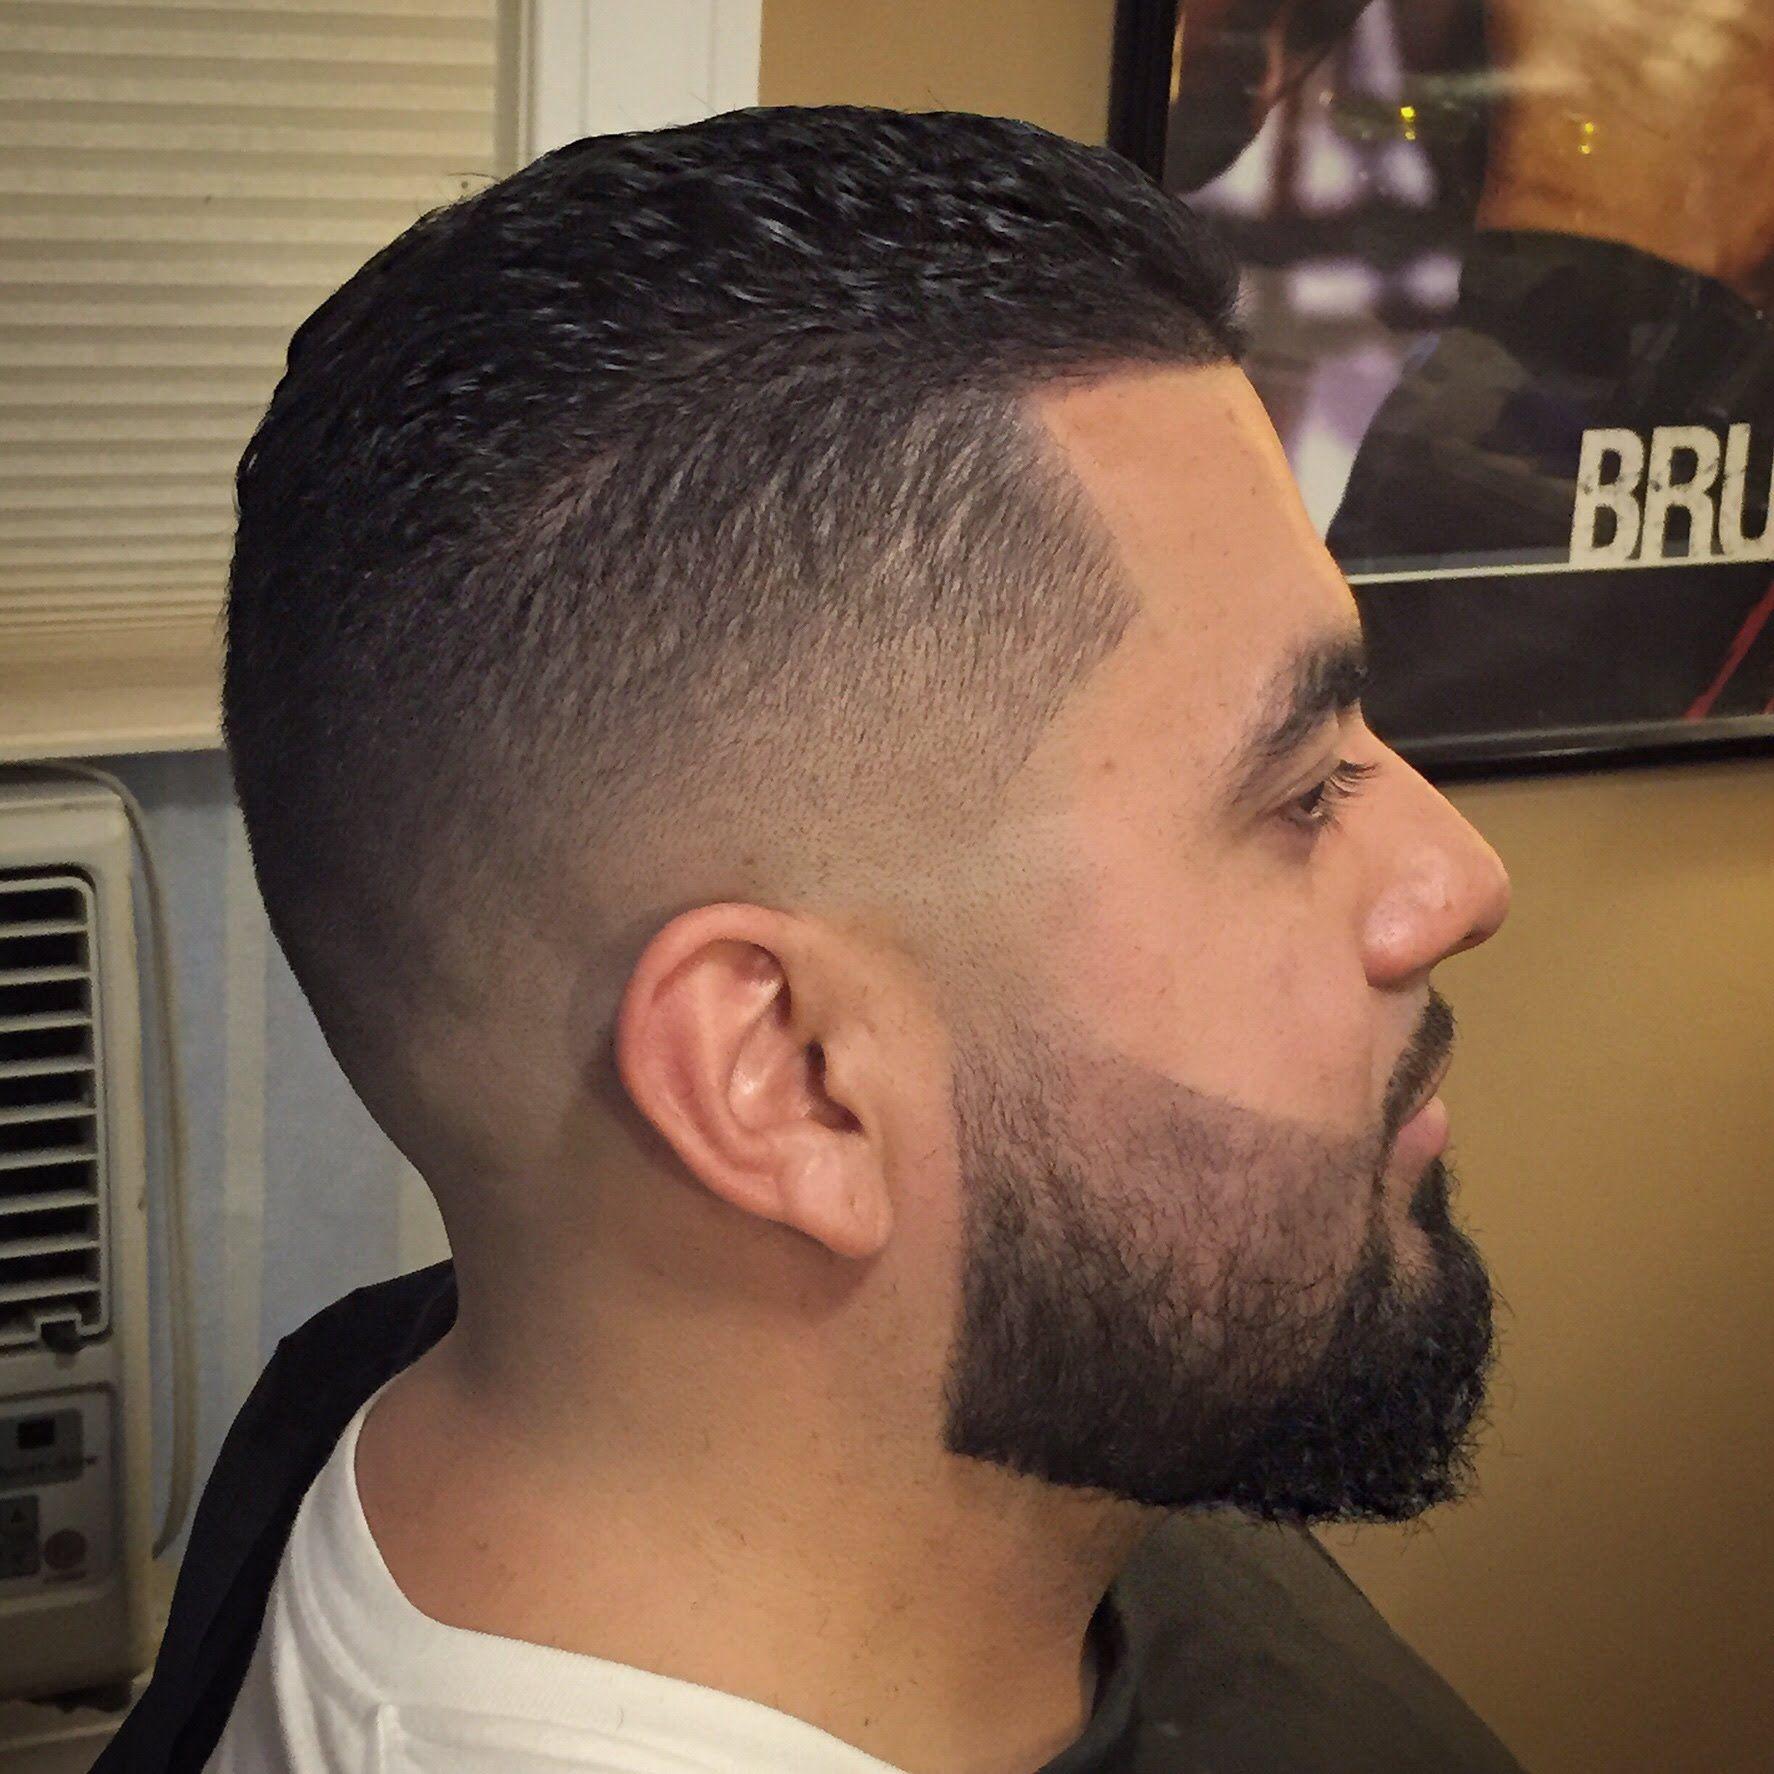 Men's Haircuts Medium No Clippers 2016 - Google Search